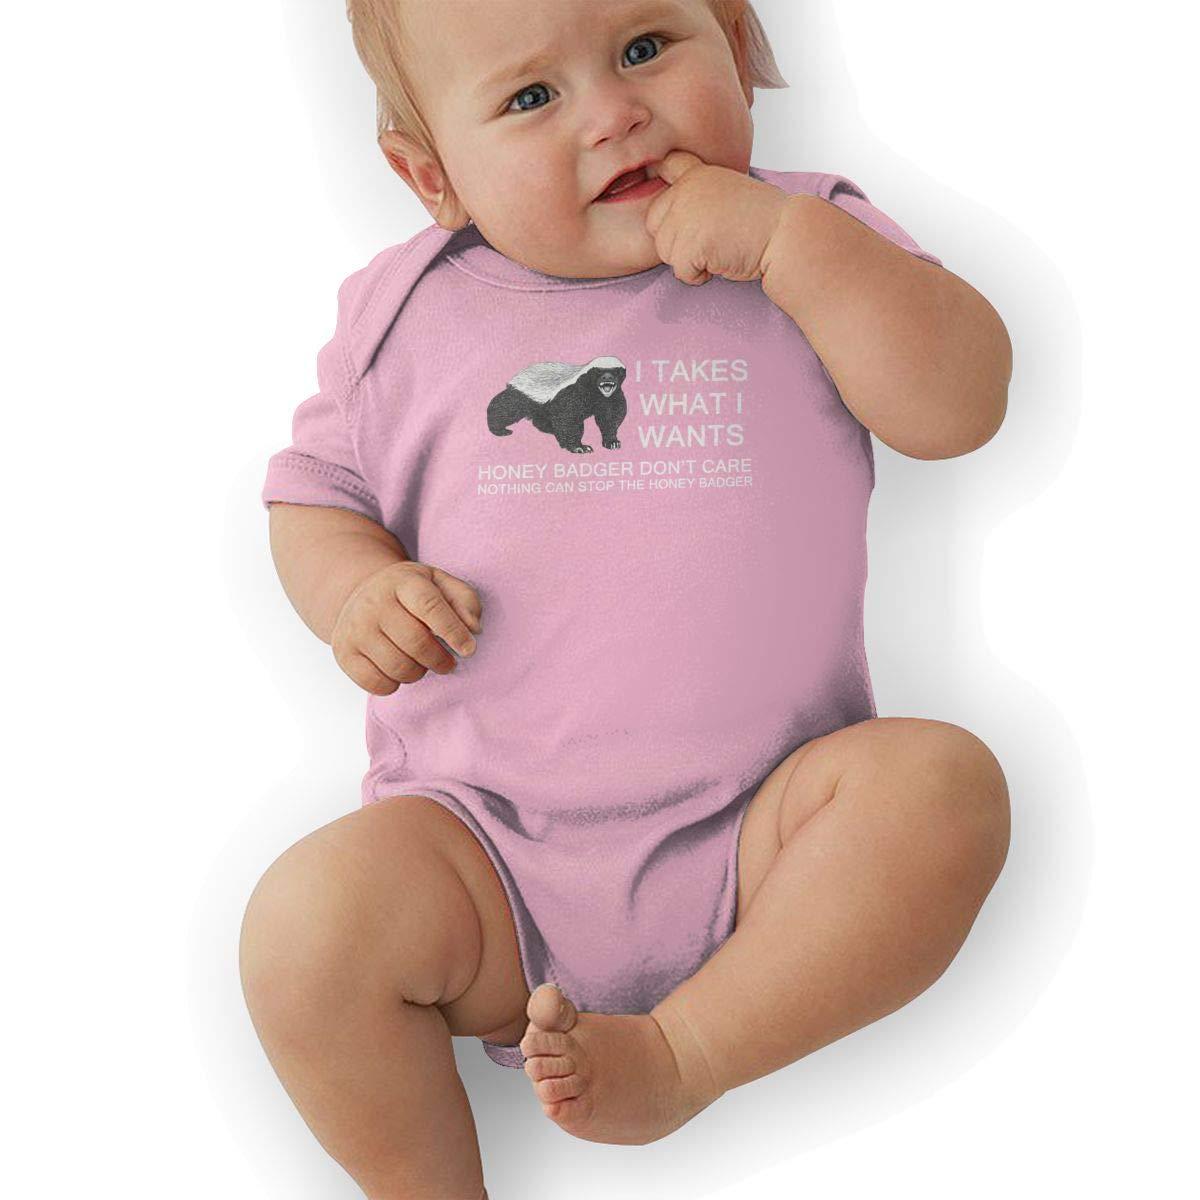 Toddler Baby Boys Bodysuit Short-Sleeve Onesie I Takes What I Wants Honey Badger Print Rompers Autumn Pajamas